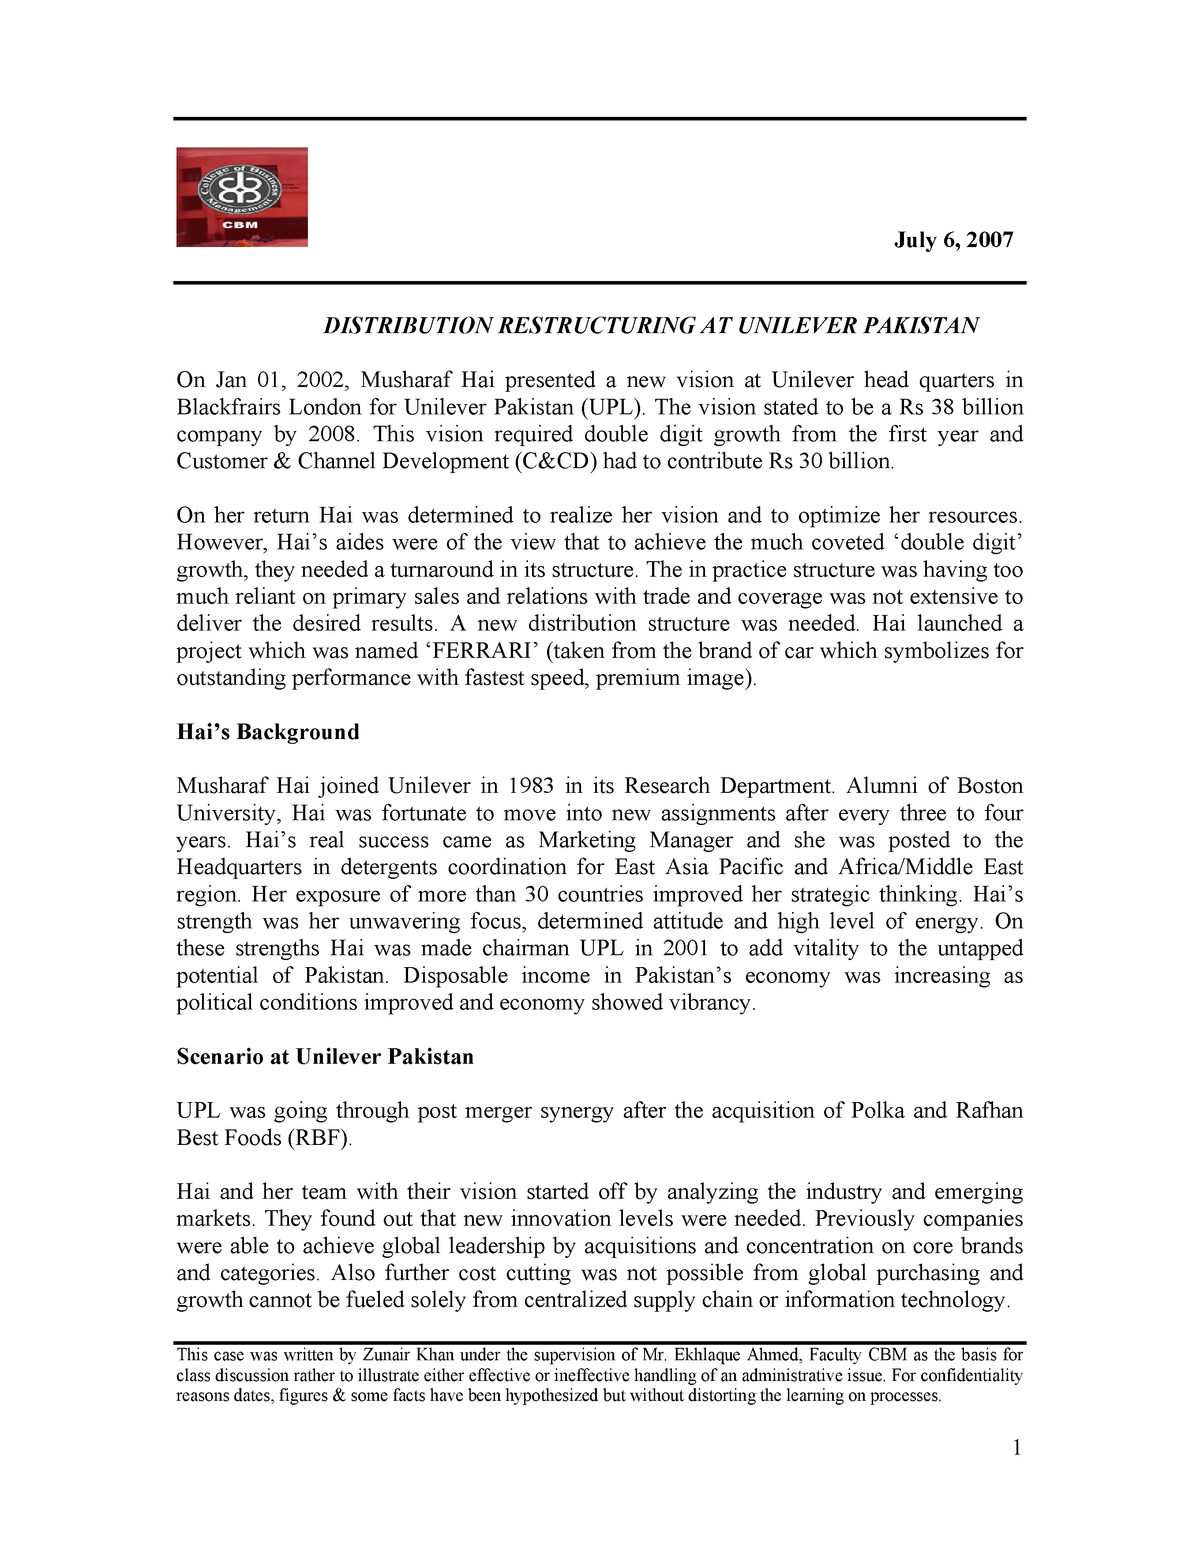 Unilever Dist Restrucing Case study - MKT-402: Marketing Management